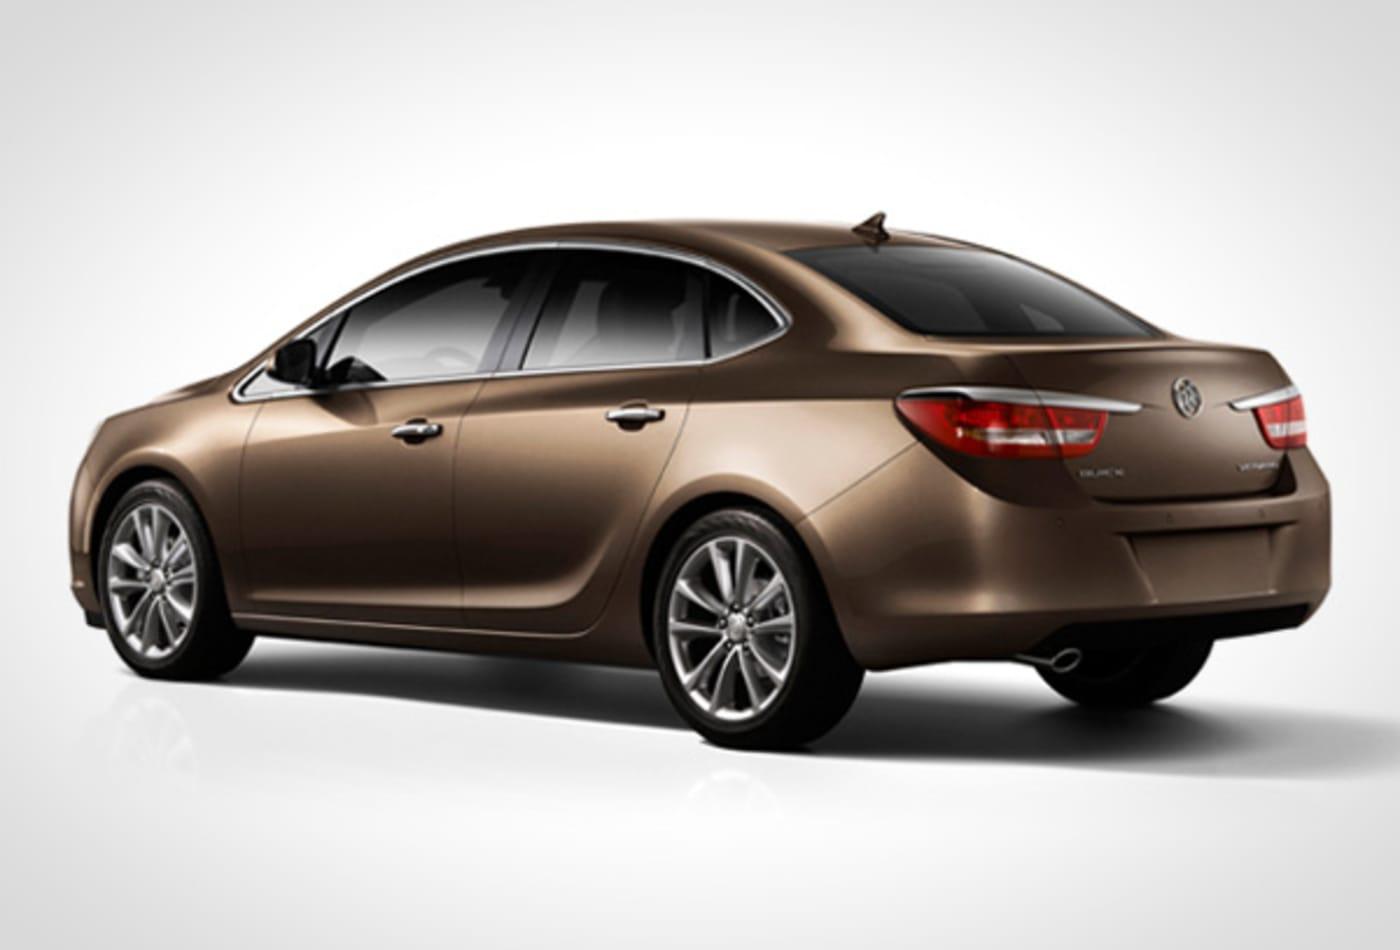 Buick-Verano-Best-Cars-Commuting-CNBC.jpg